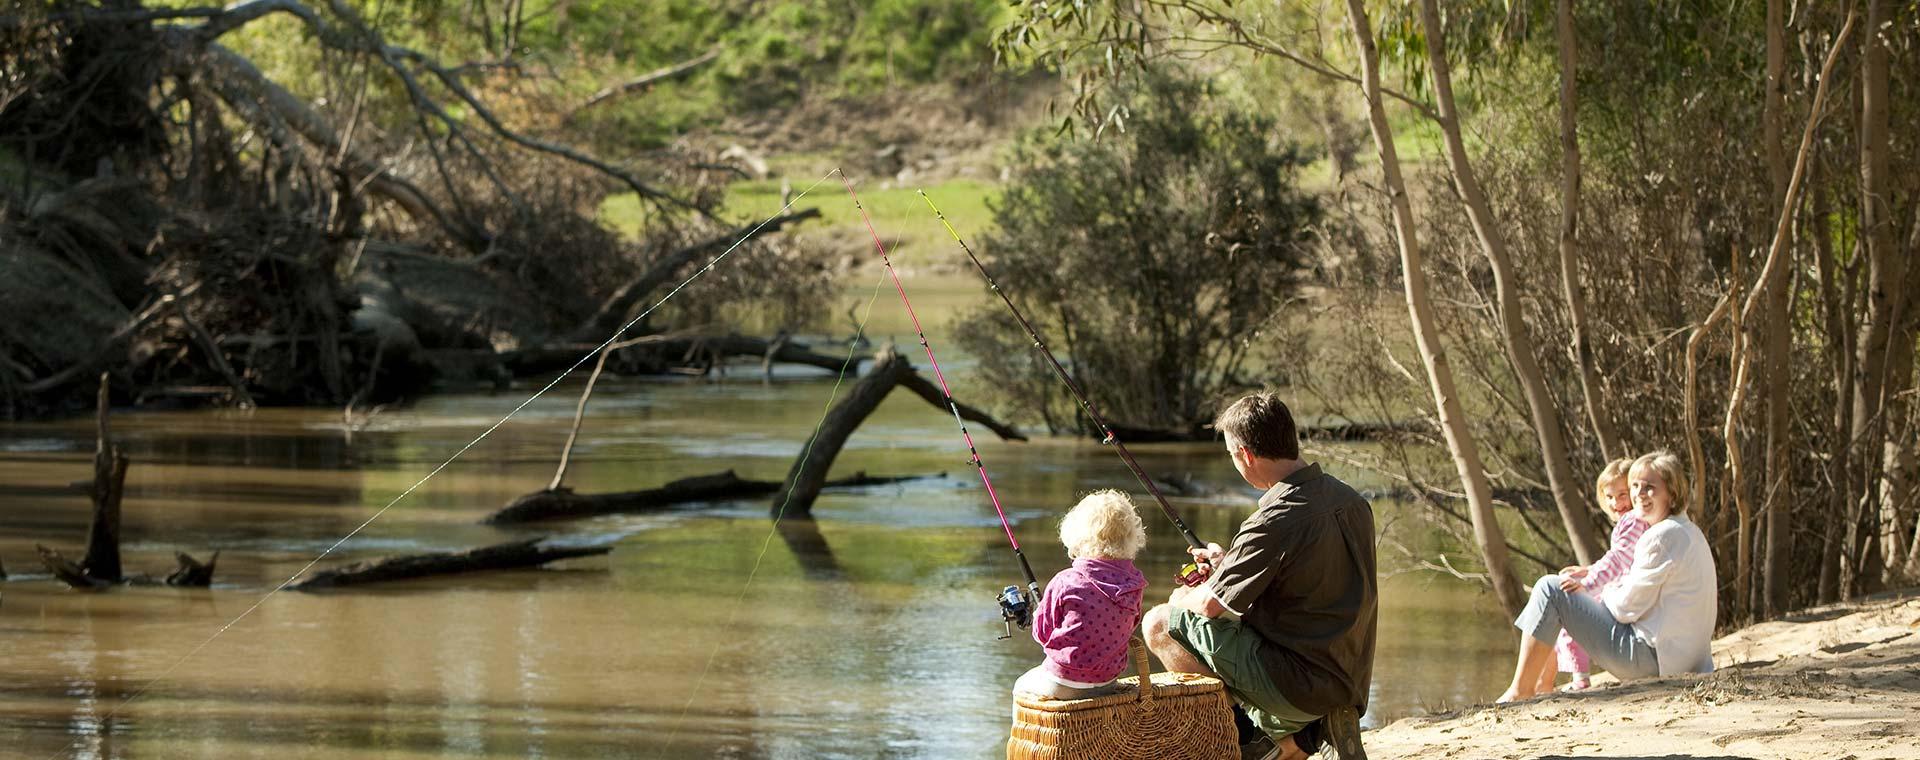 Family enjoying a fishing picnic by the river.